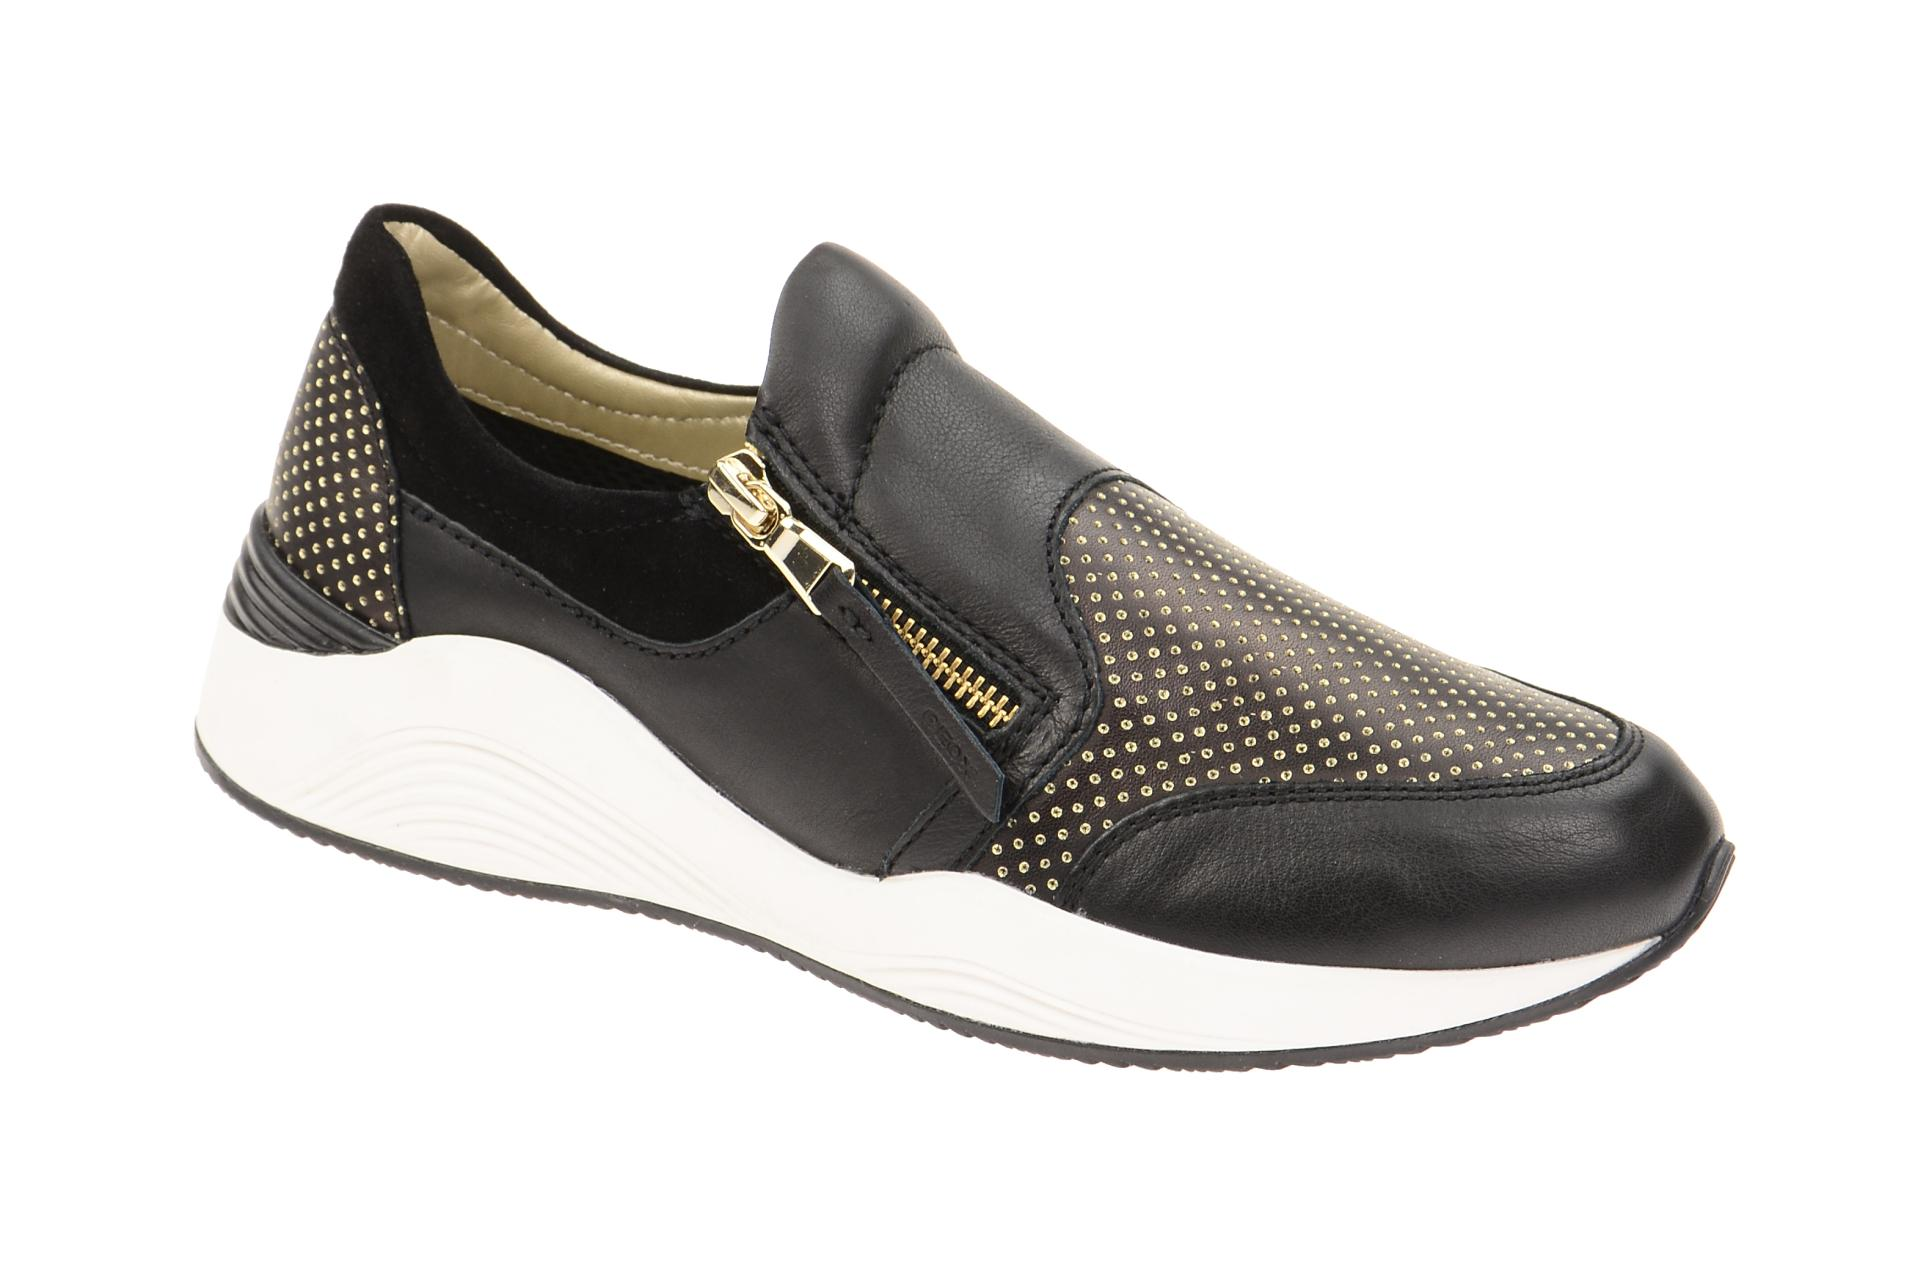 geox schuhe omaya schwarz damenschuhe bequeme slipper. Black Bedroom Furniture Sets. Home Design Ideas